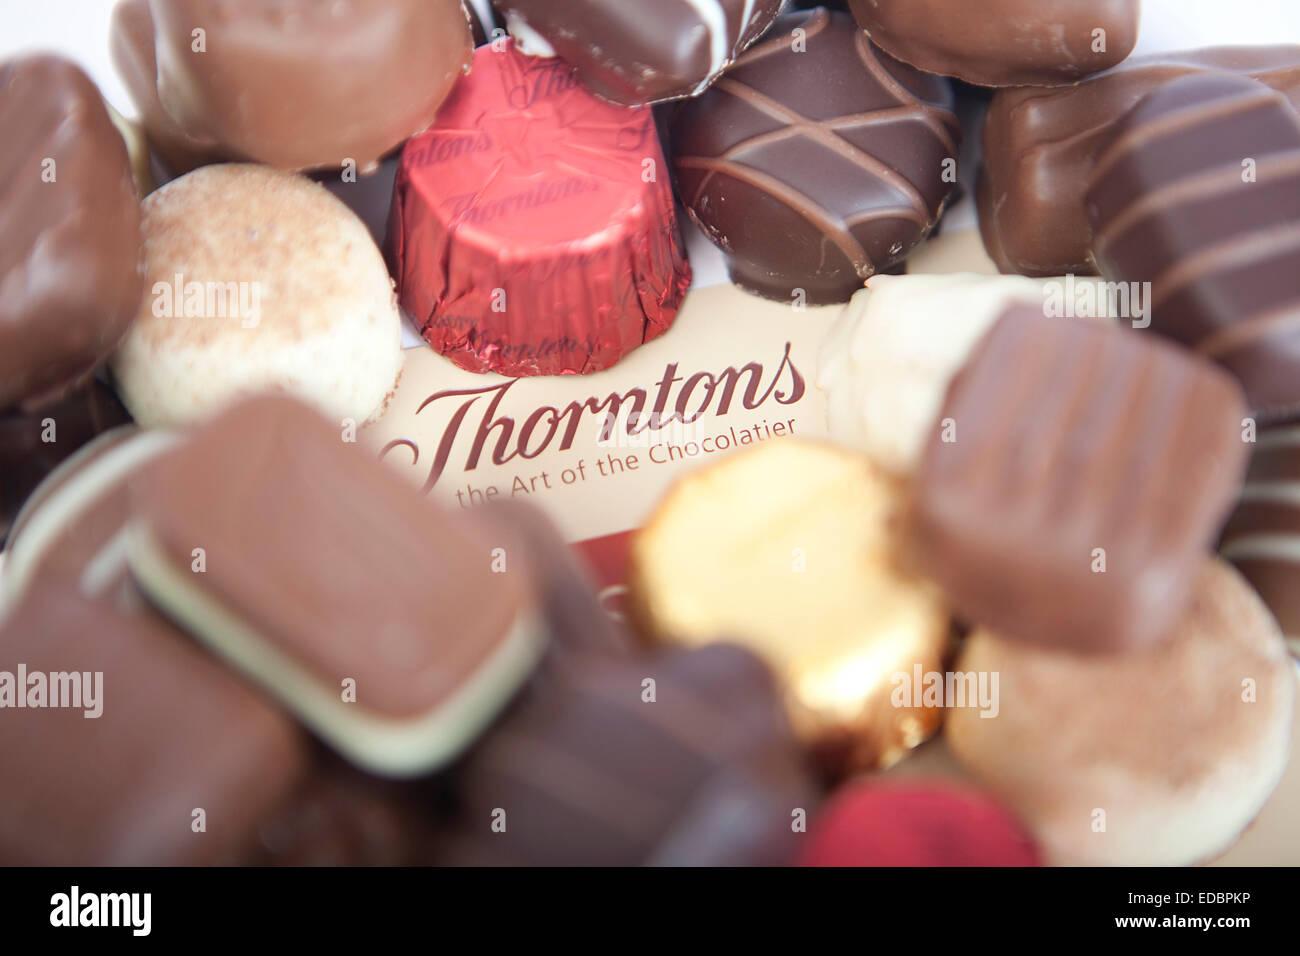 Illustrative image of Thorntons chocolate. - Stock Image